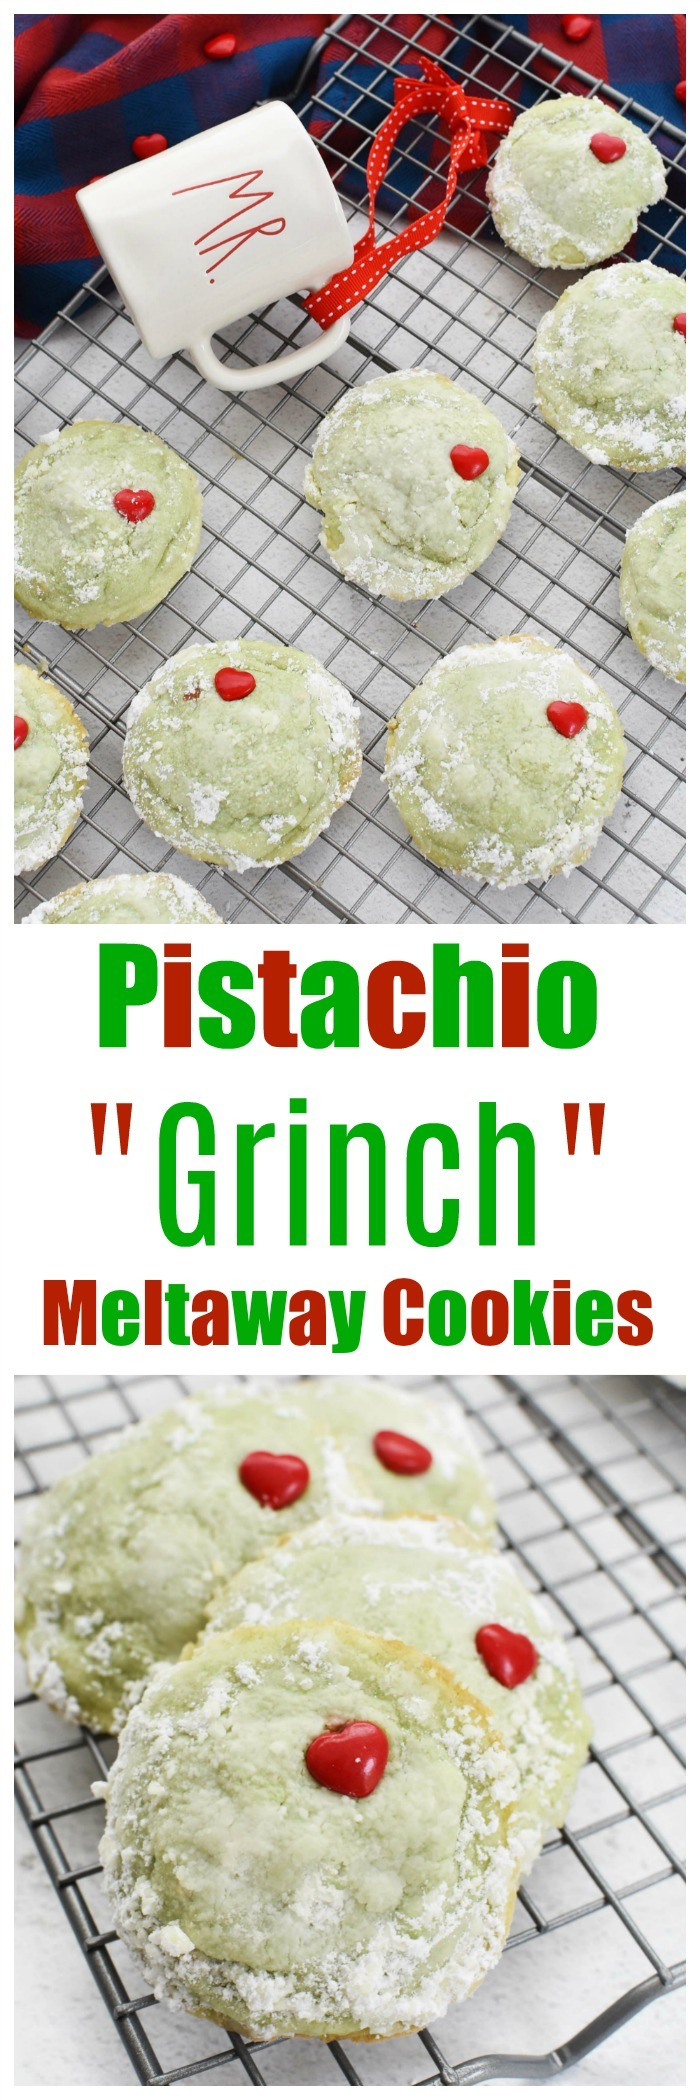 Pistachio Meltaway Cookies Grinch Style